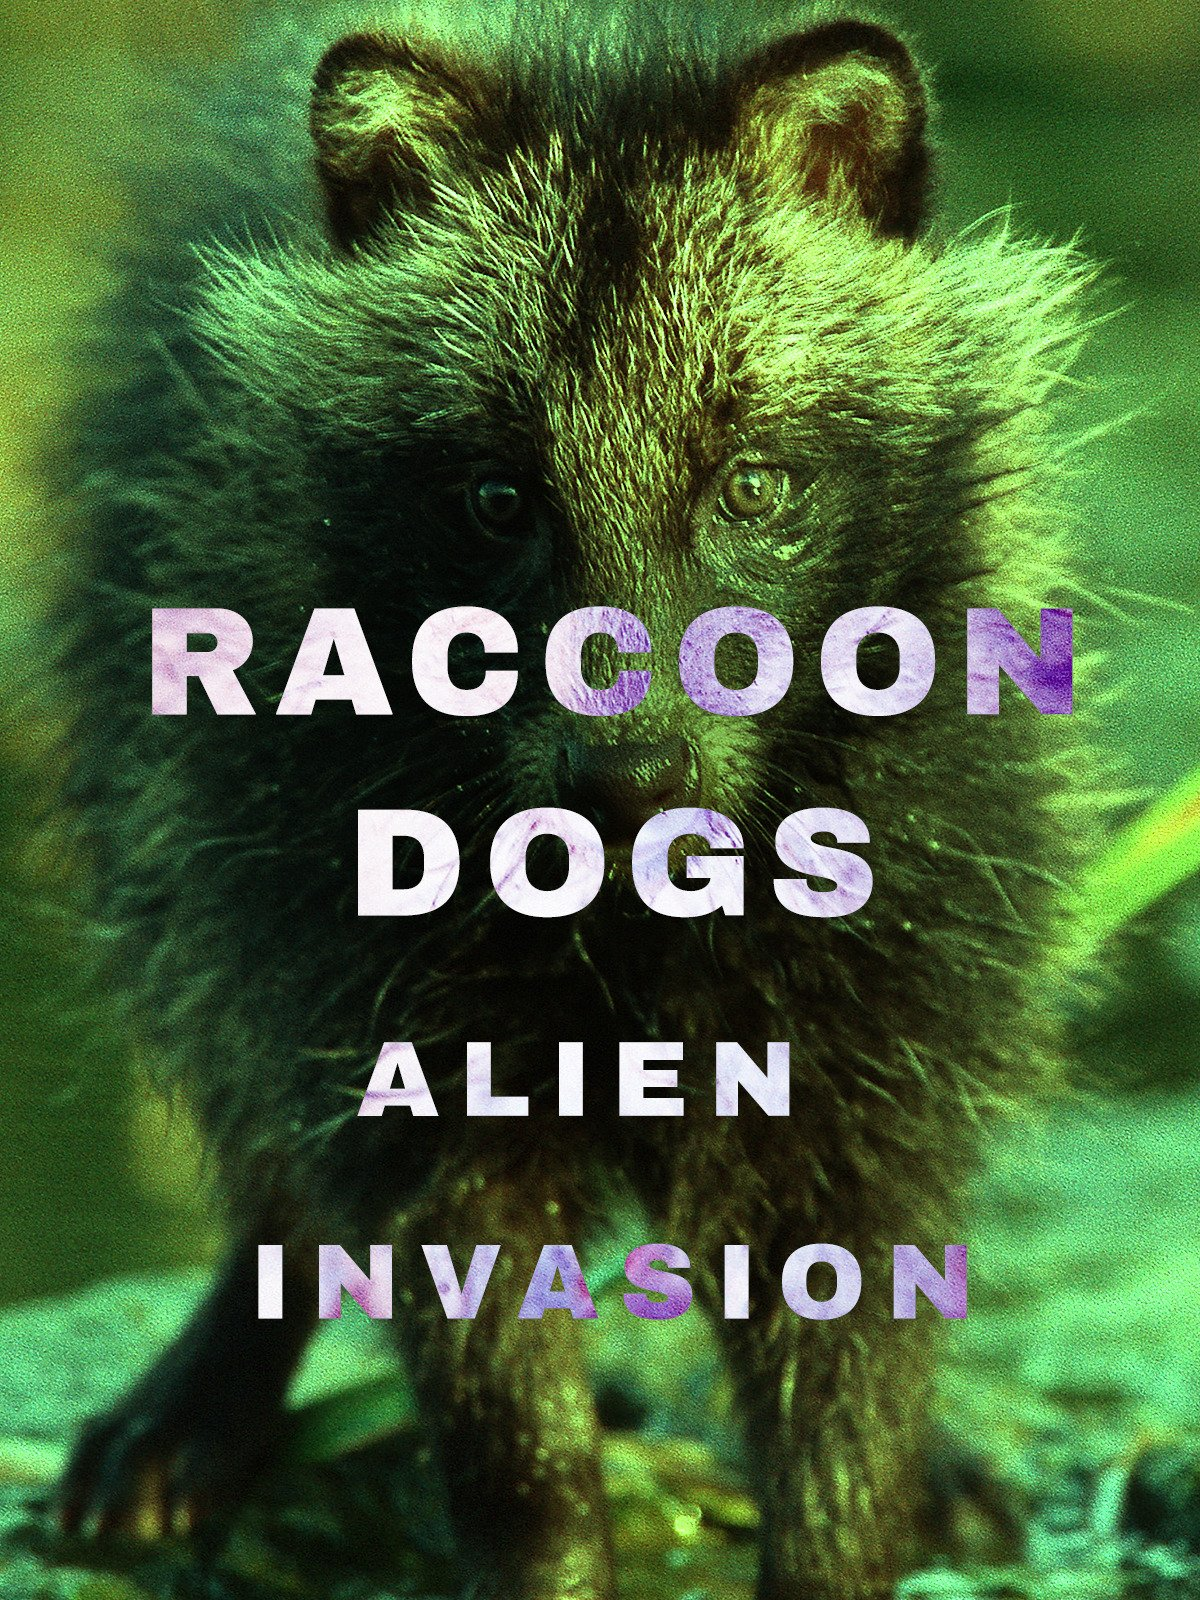 Raccoon Dogs: Alien Invasion on Amazon Prime Video UK